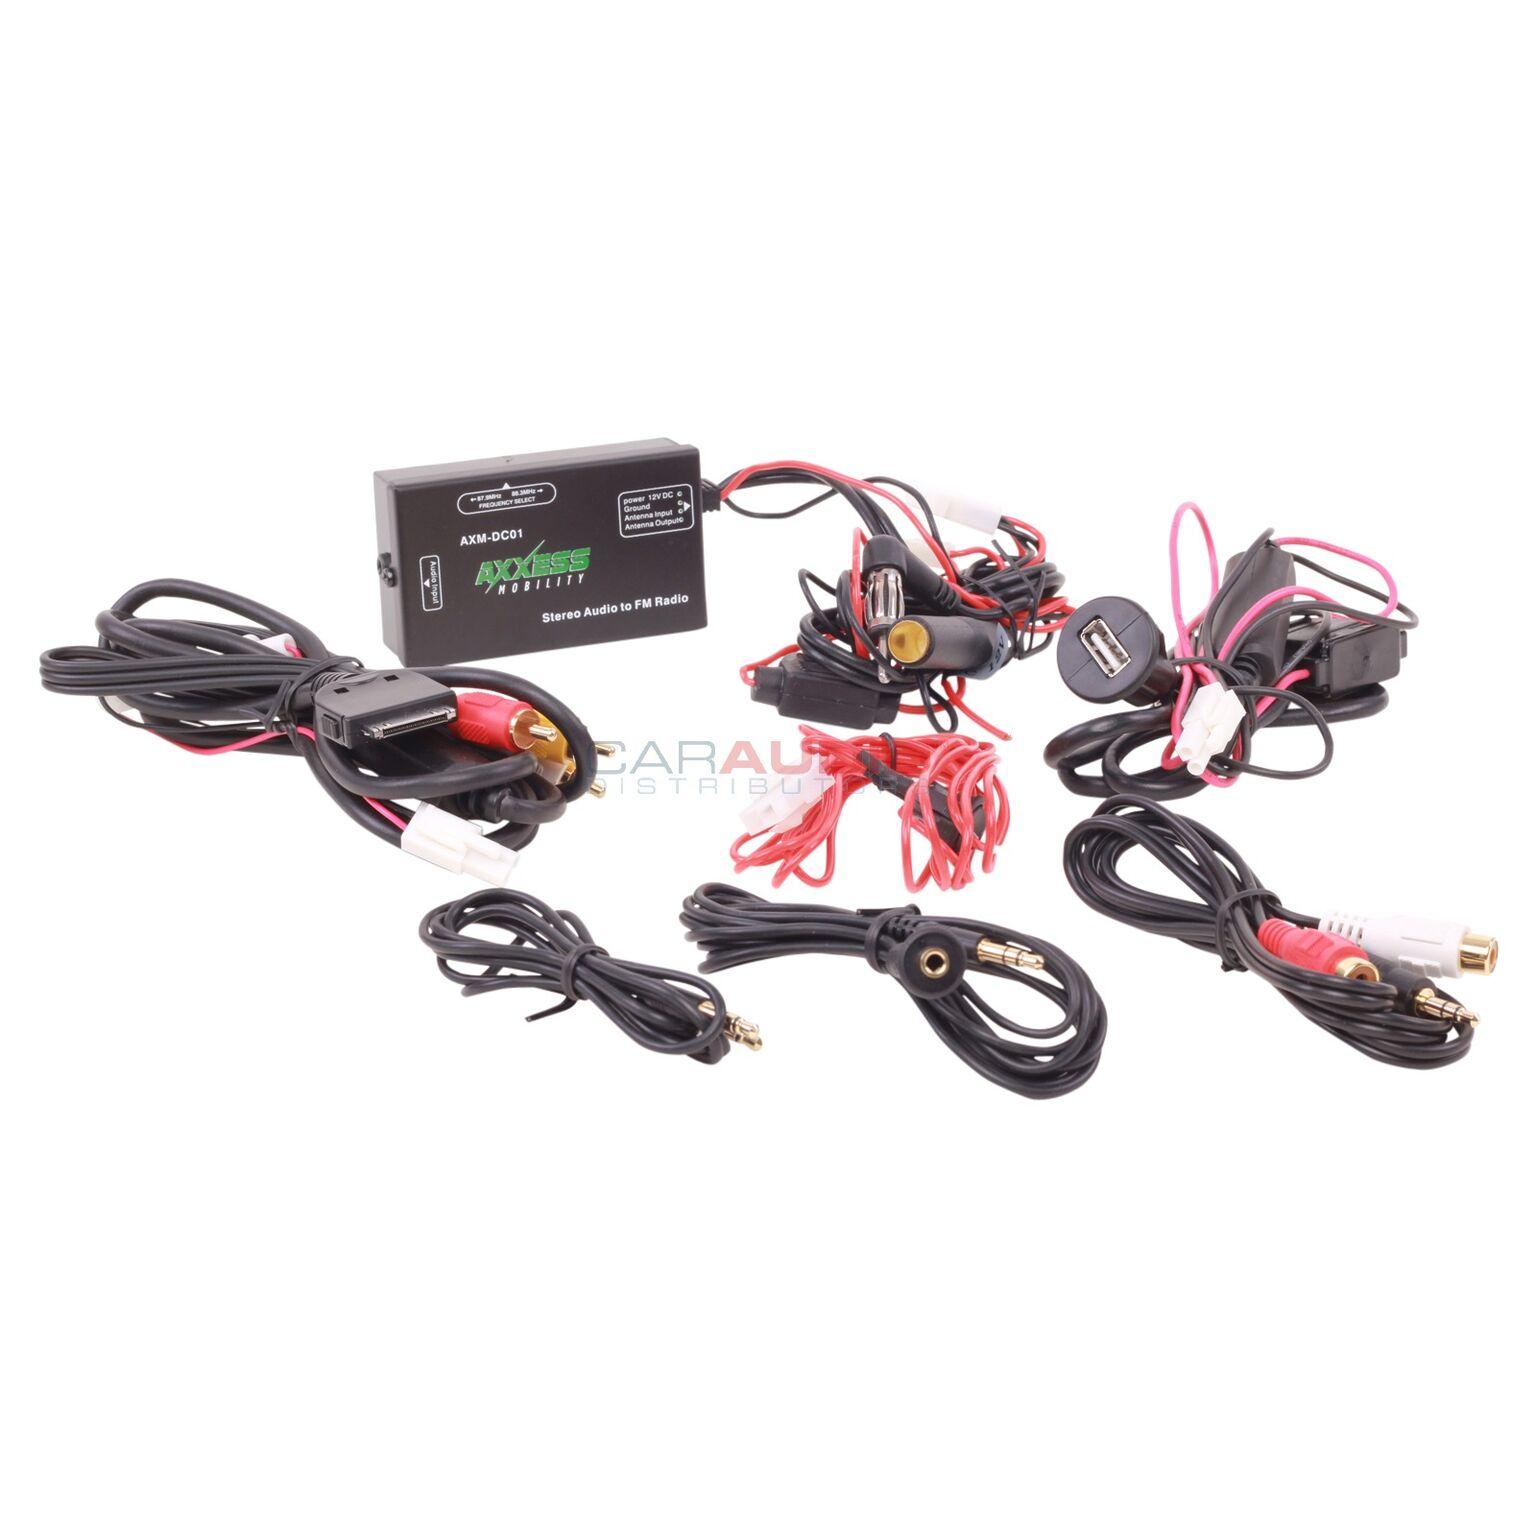 AXXESS Mobility AXM-DC01 Wired FM Modulator Universal Ste...